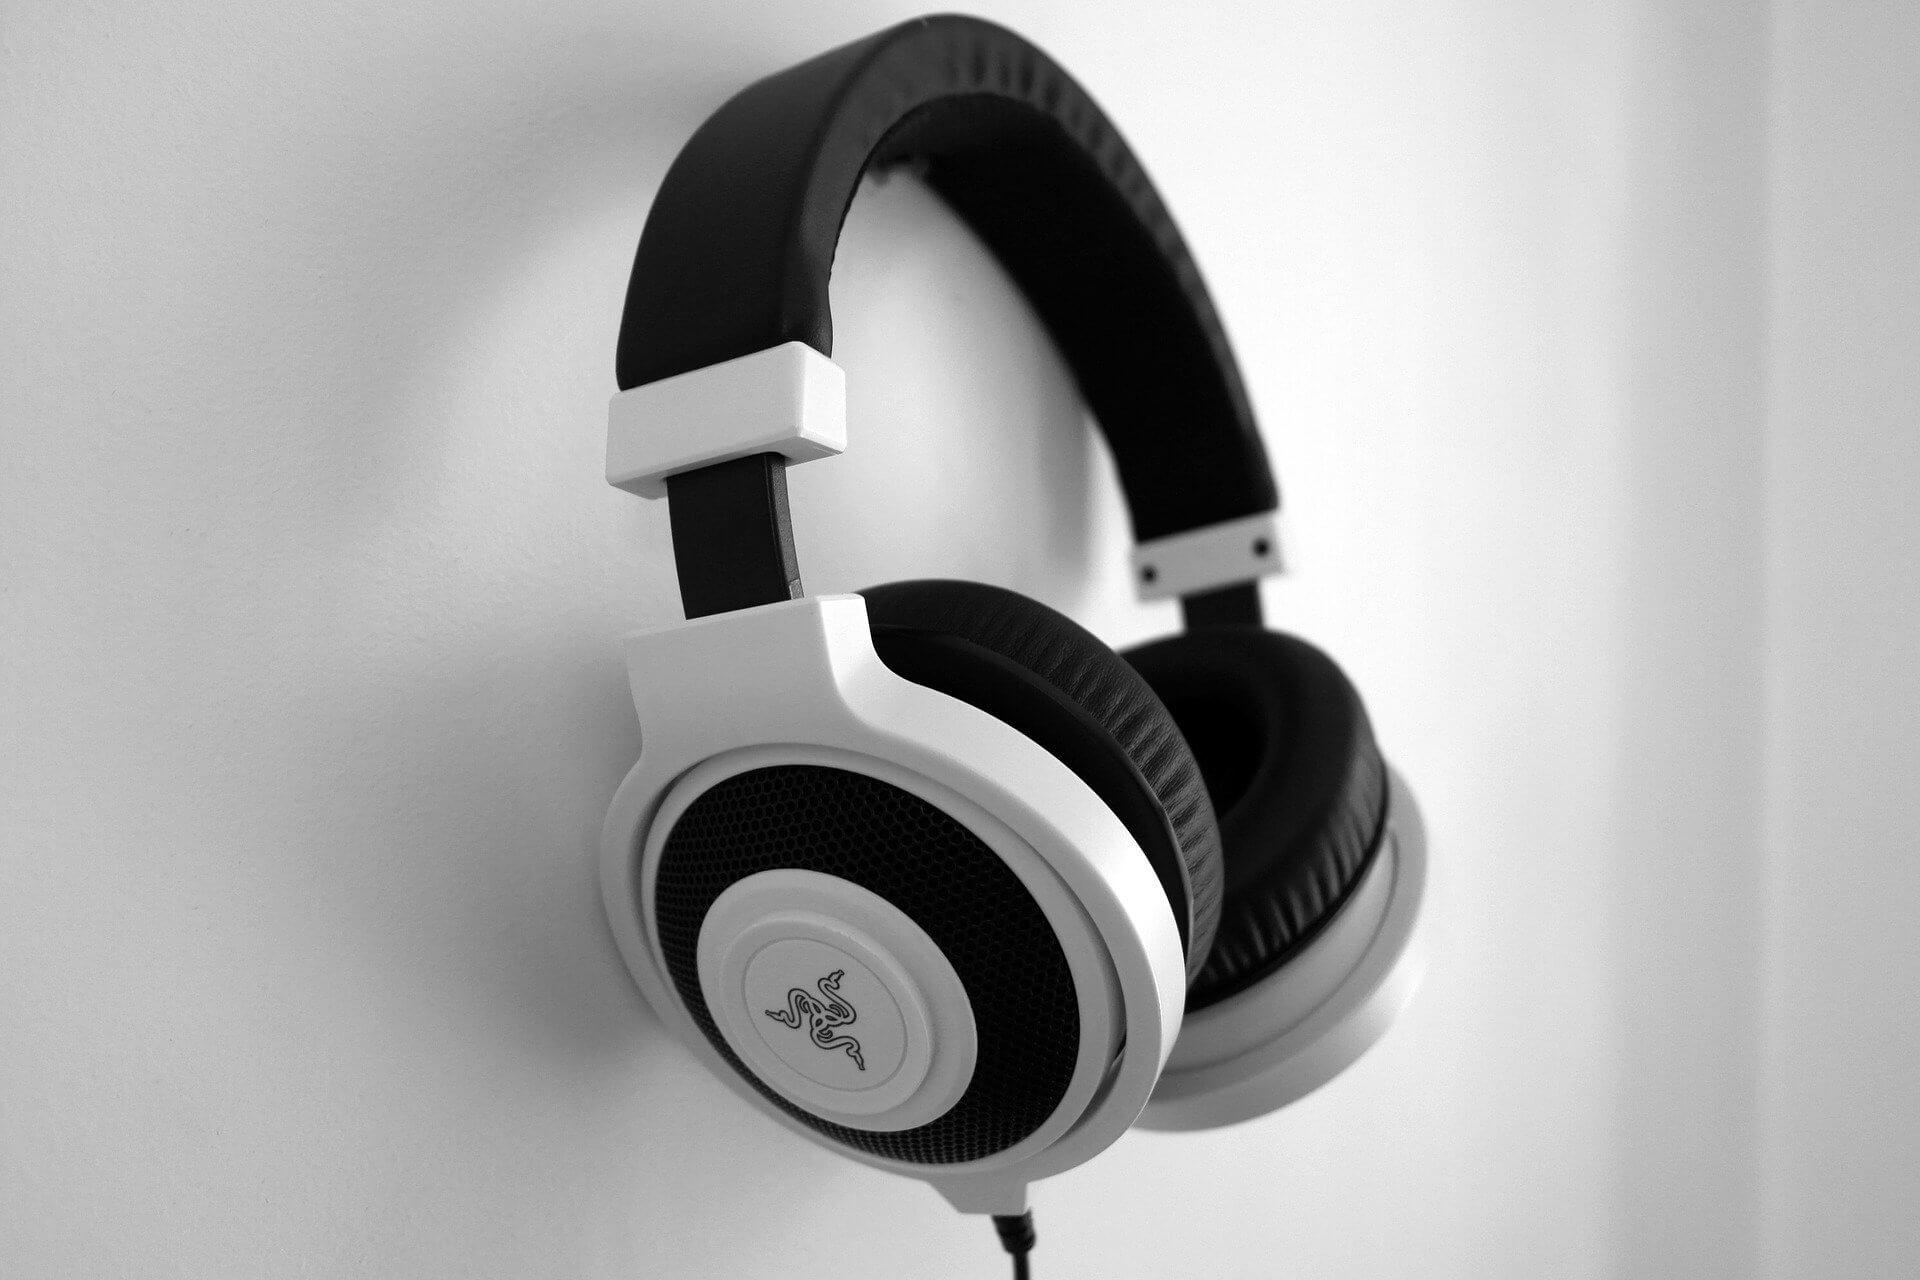 7 Best Gaming Headphones Under 1500 in India 2021